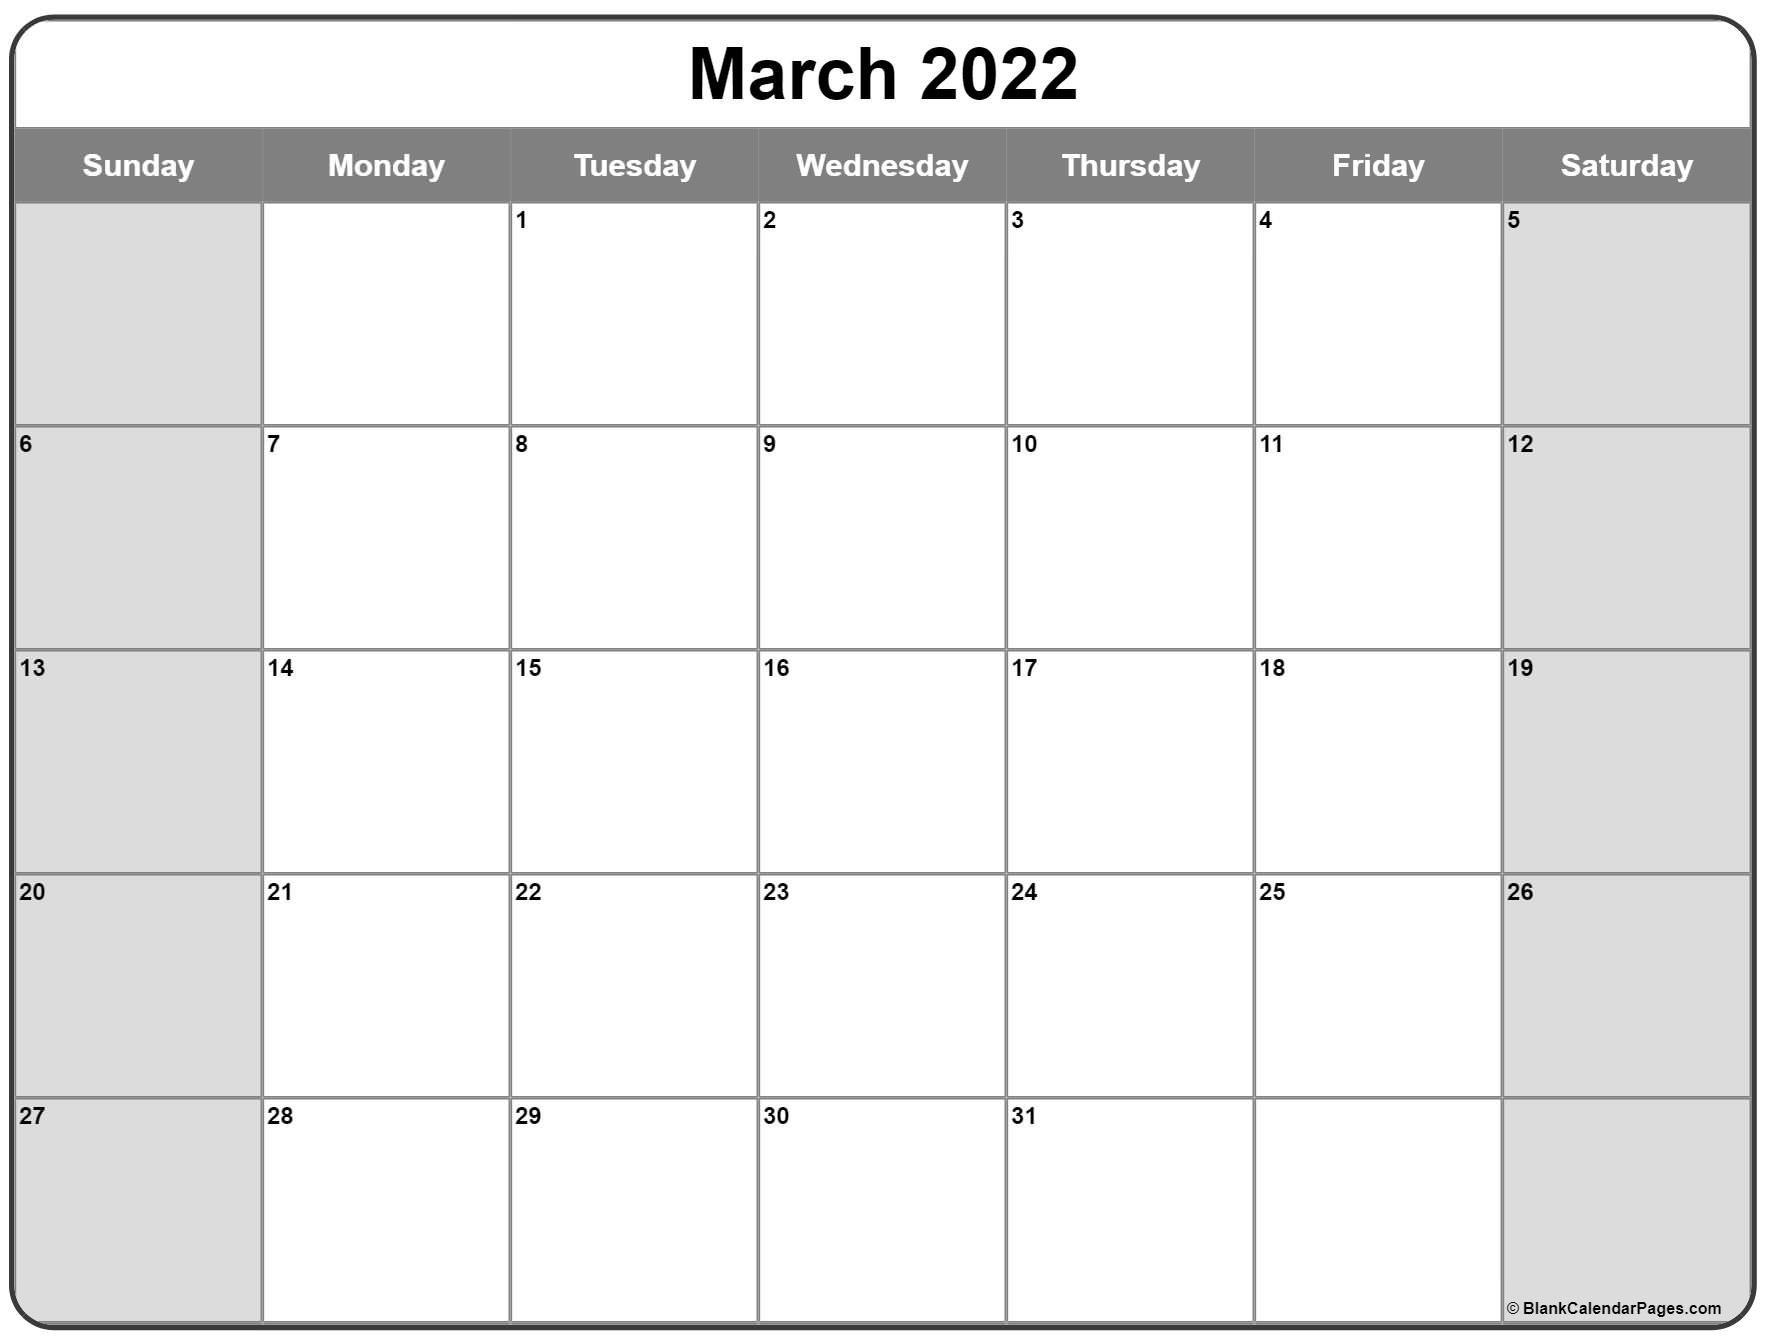 March 2022 Calendar   Free Printable Calendar Templates regarding Free Monthly Planner 2022 Graphics